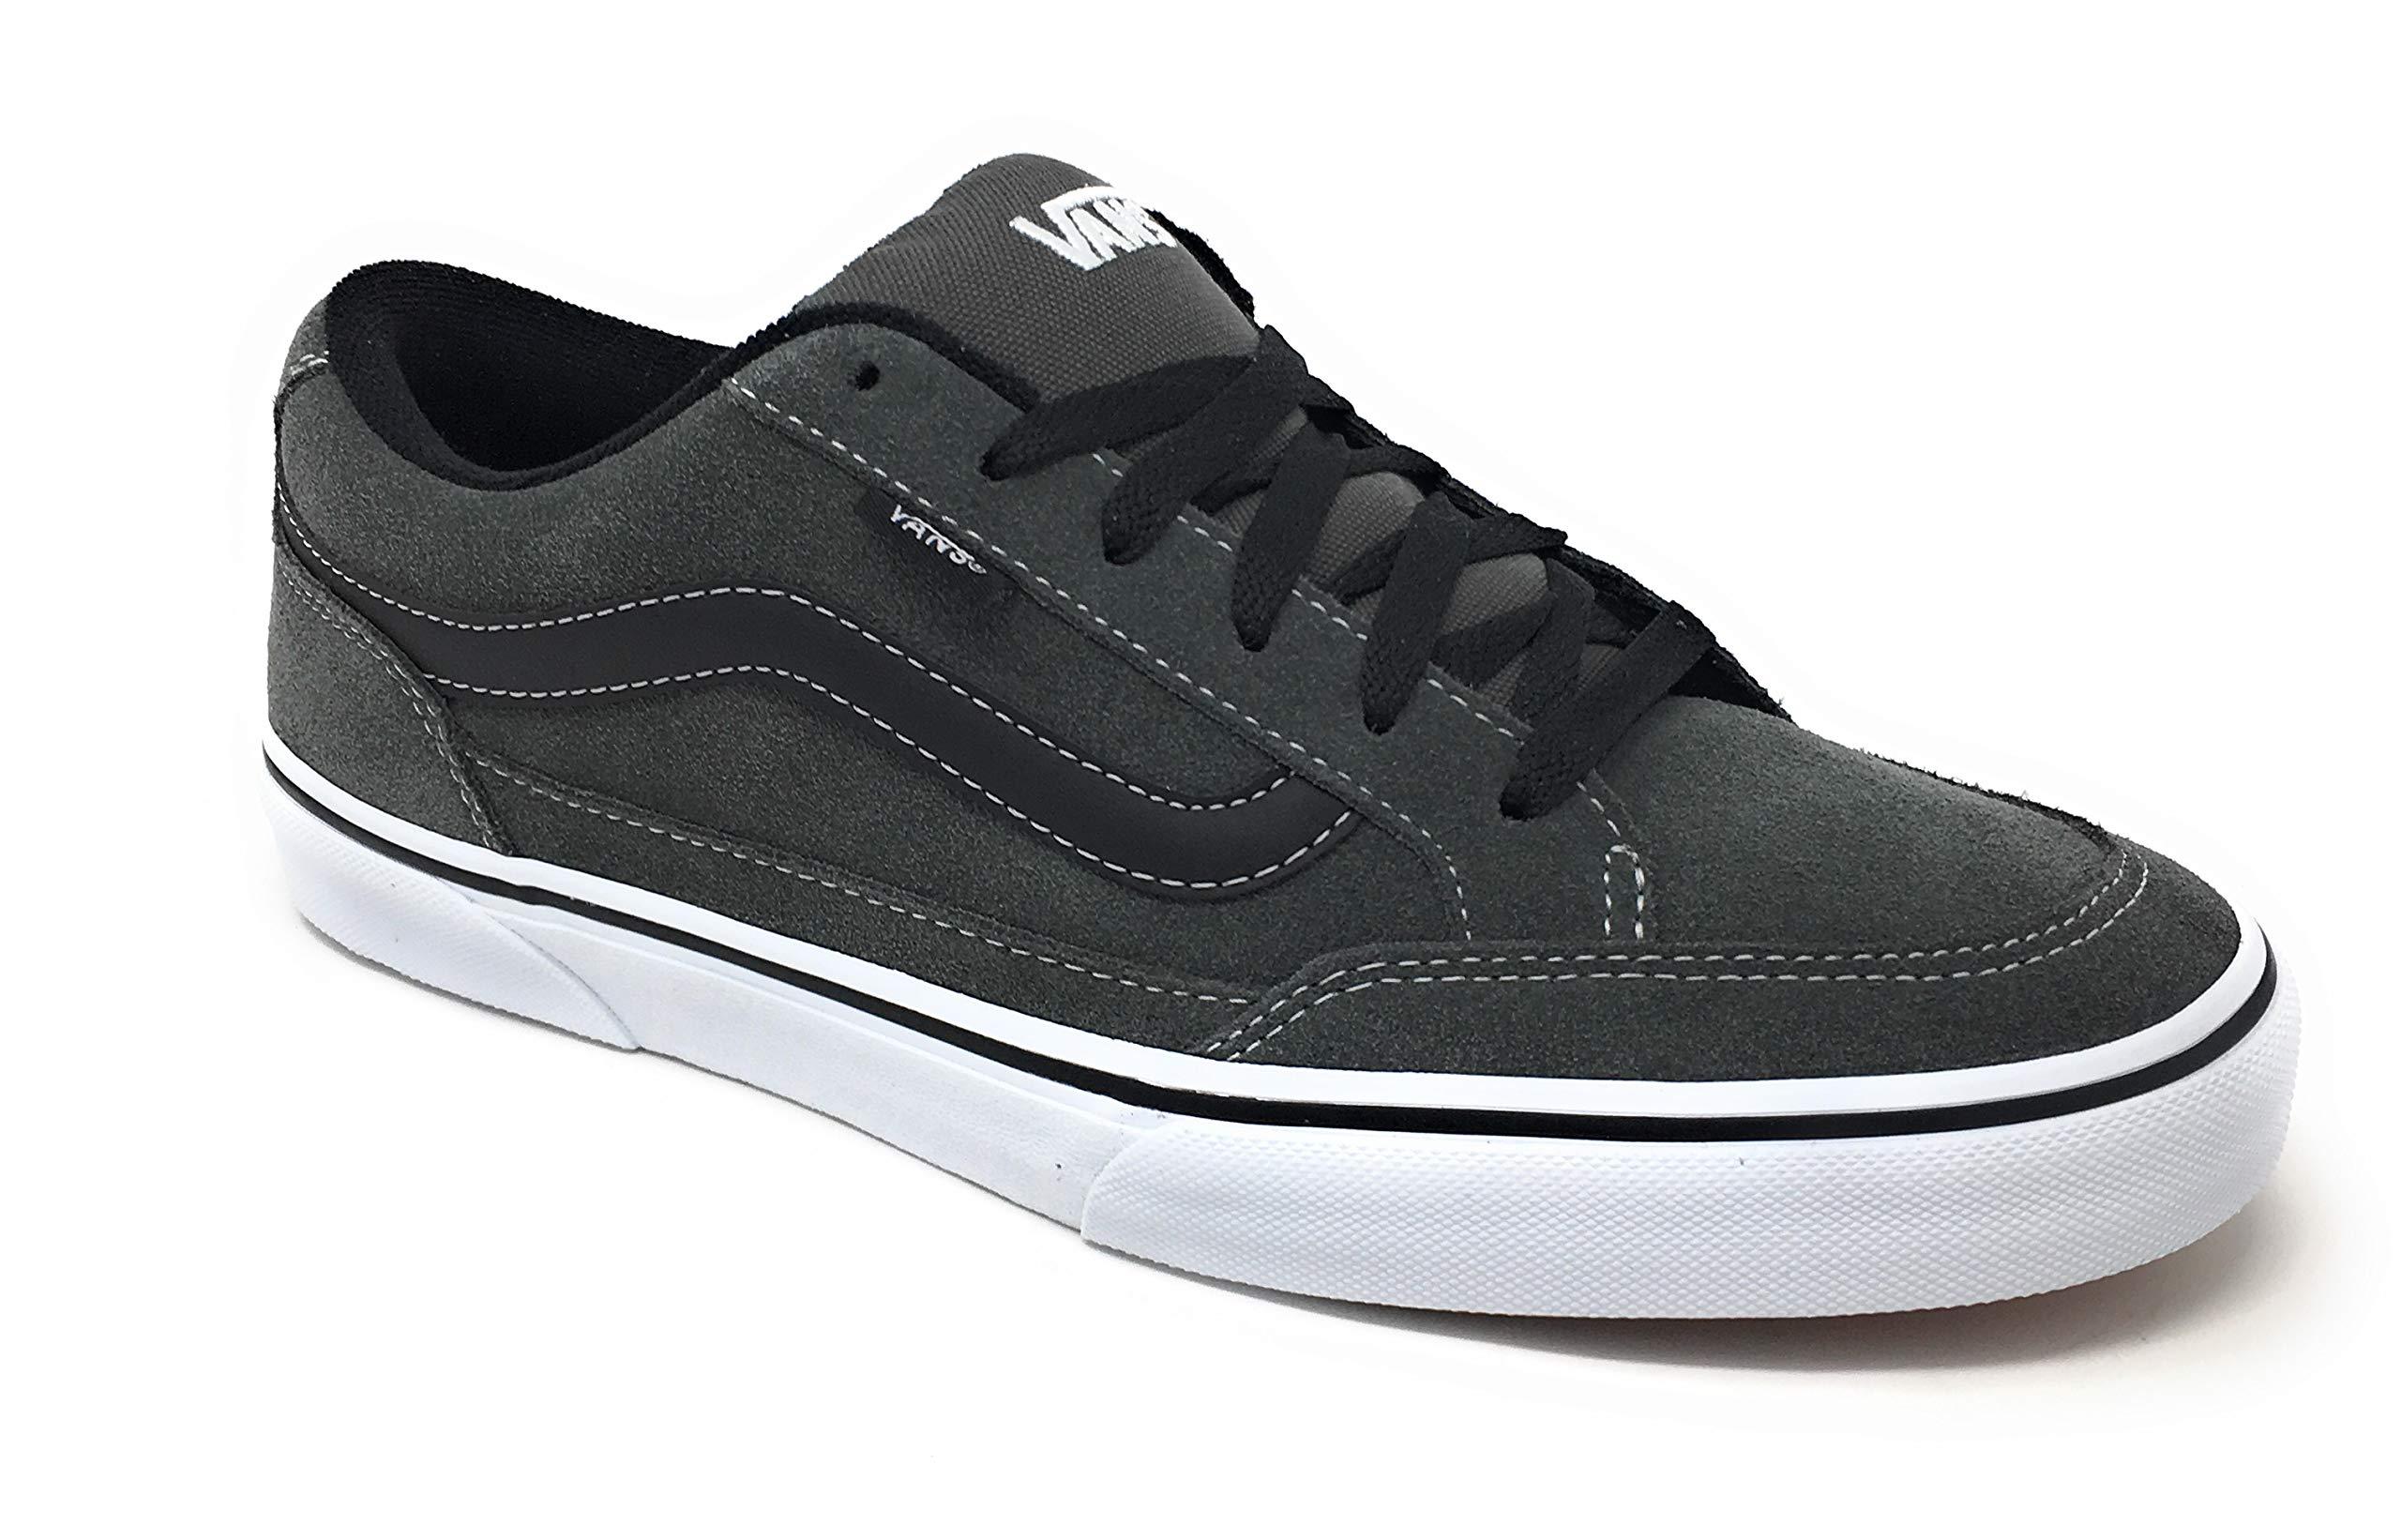 Vans Mens Bearcat Skate Shoes (6.5 M US, Charcoal/White/Black)